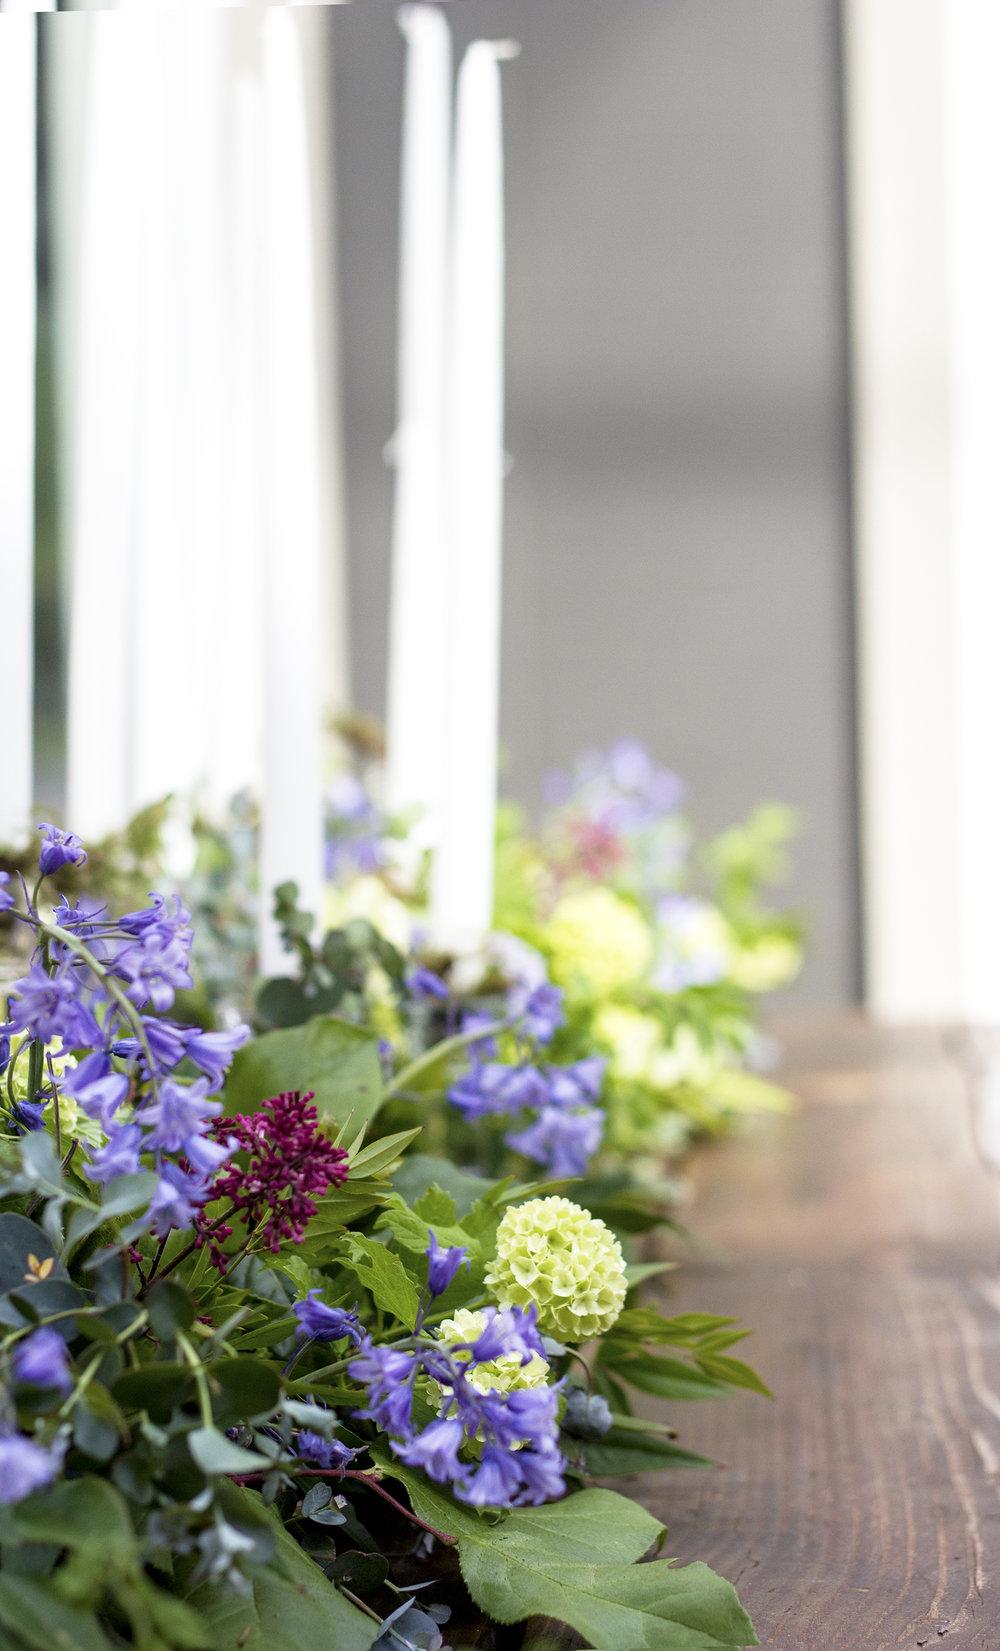 reduced_ss_centerpiece_viburnum_scilla_marry_me_in_monroe_spring_flowers.jpg